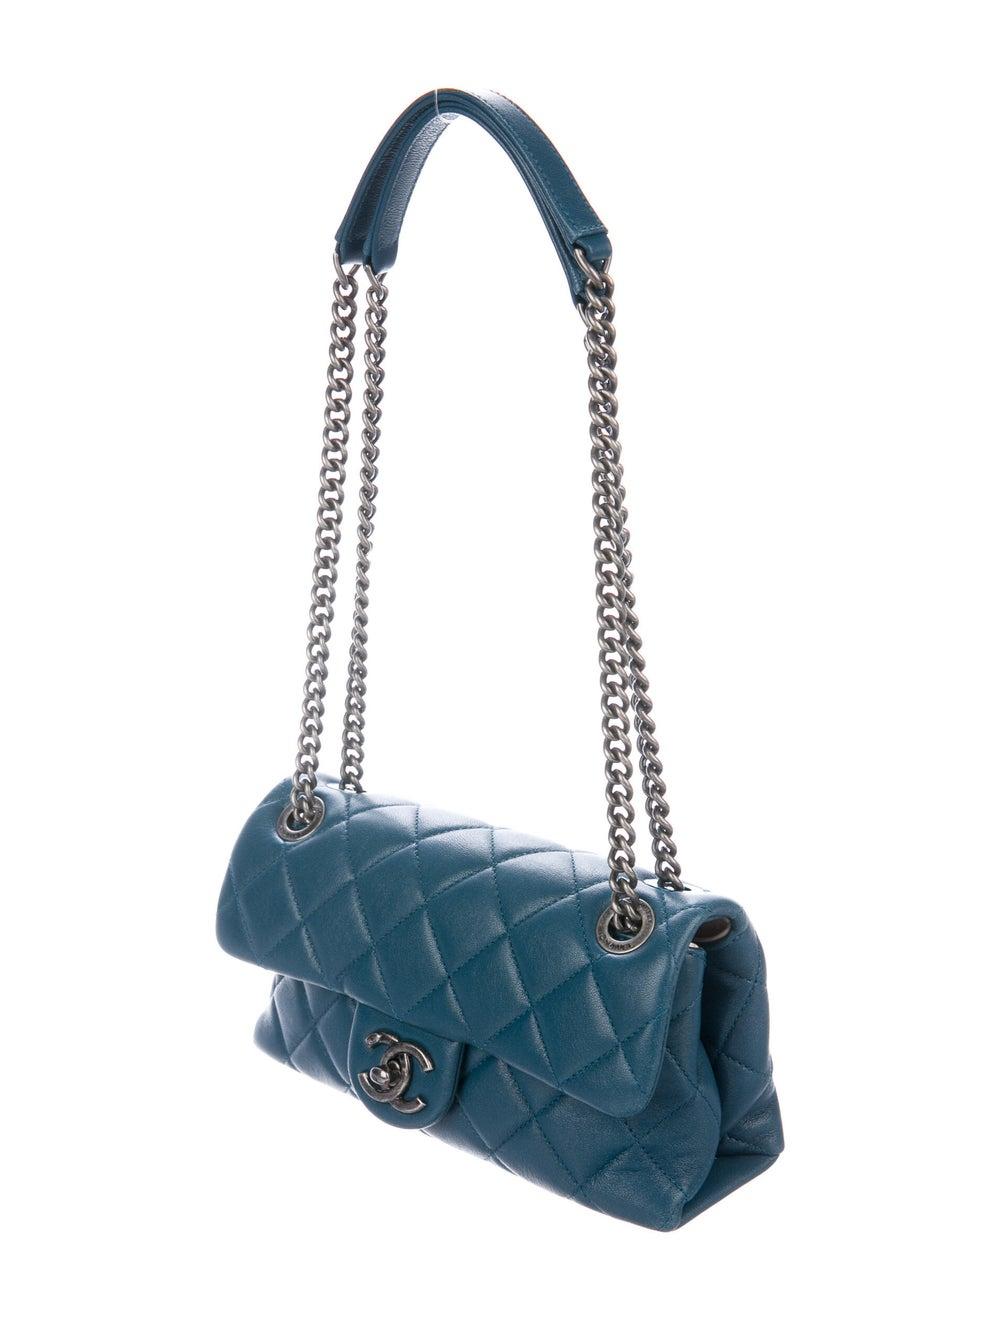 Chanel Small Burgundy Rocks Flap Bag Blue - image 3